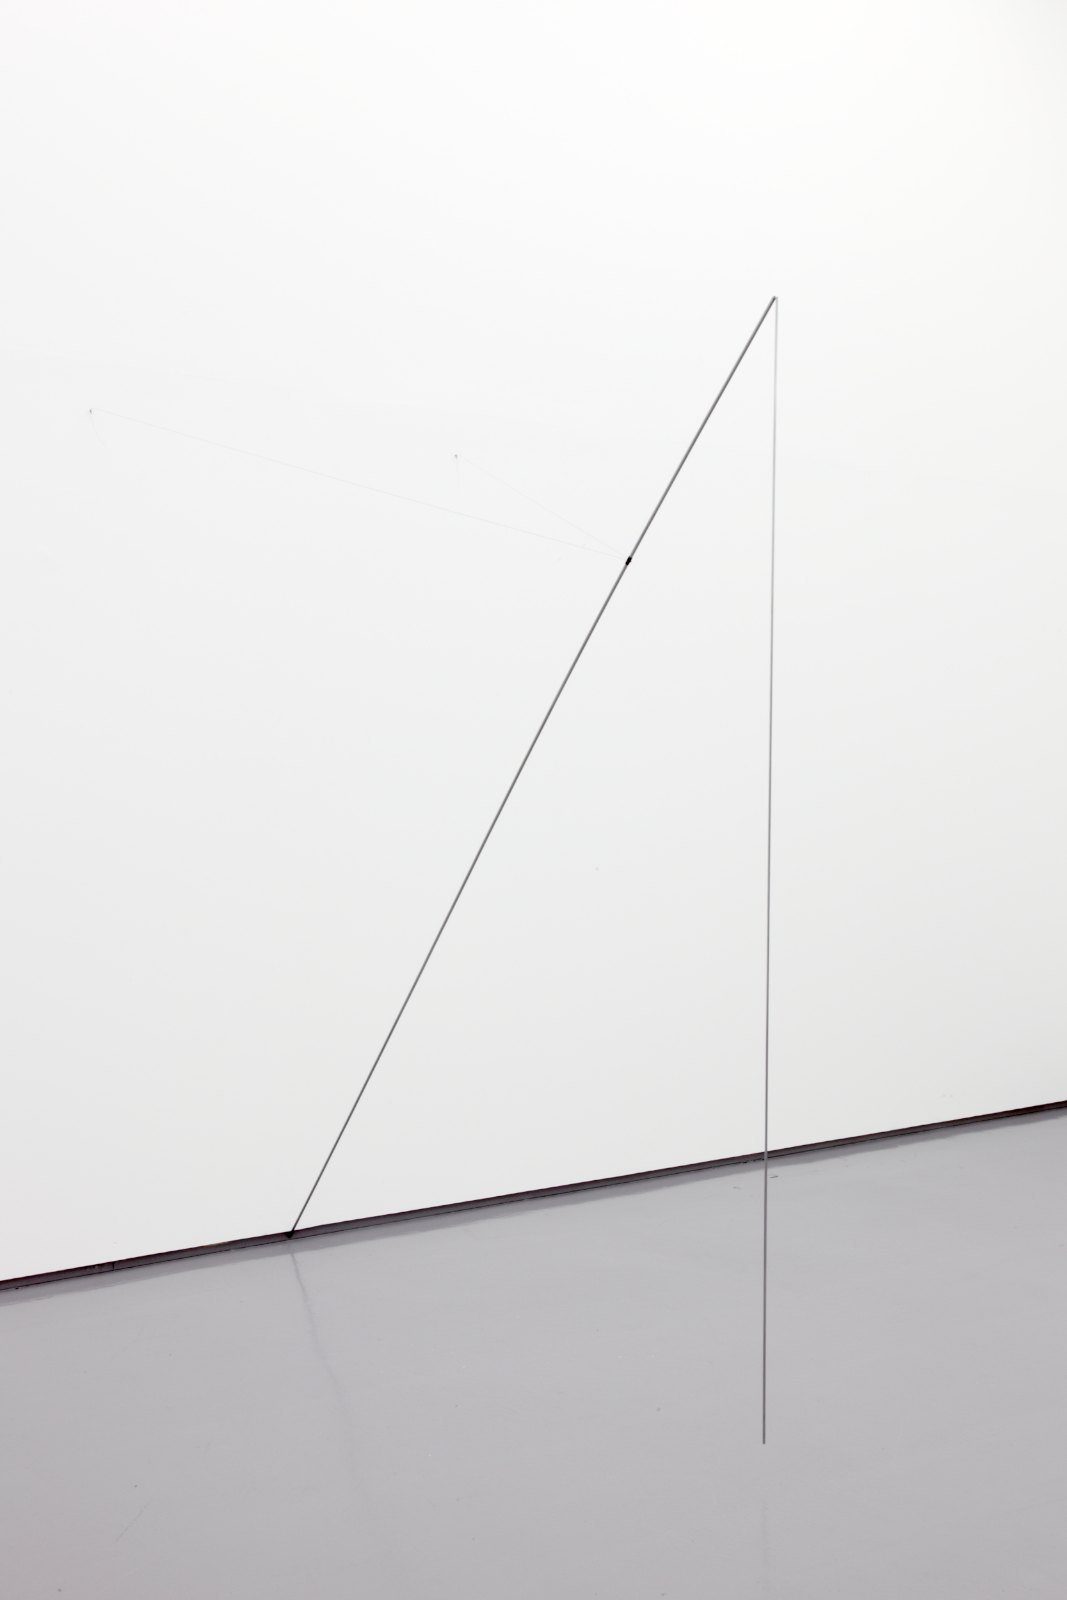 Sculpture II, 2004, steel, silver, 220 x 214 x 207 cm